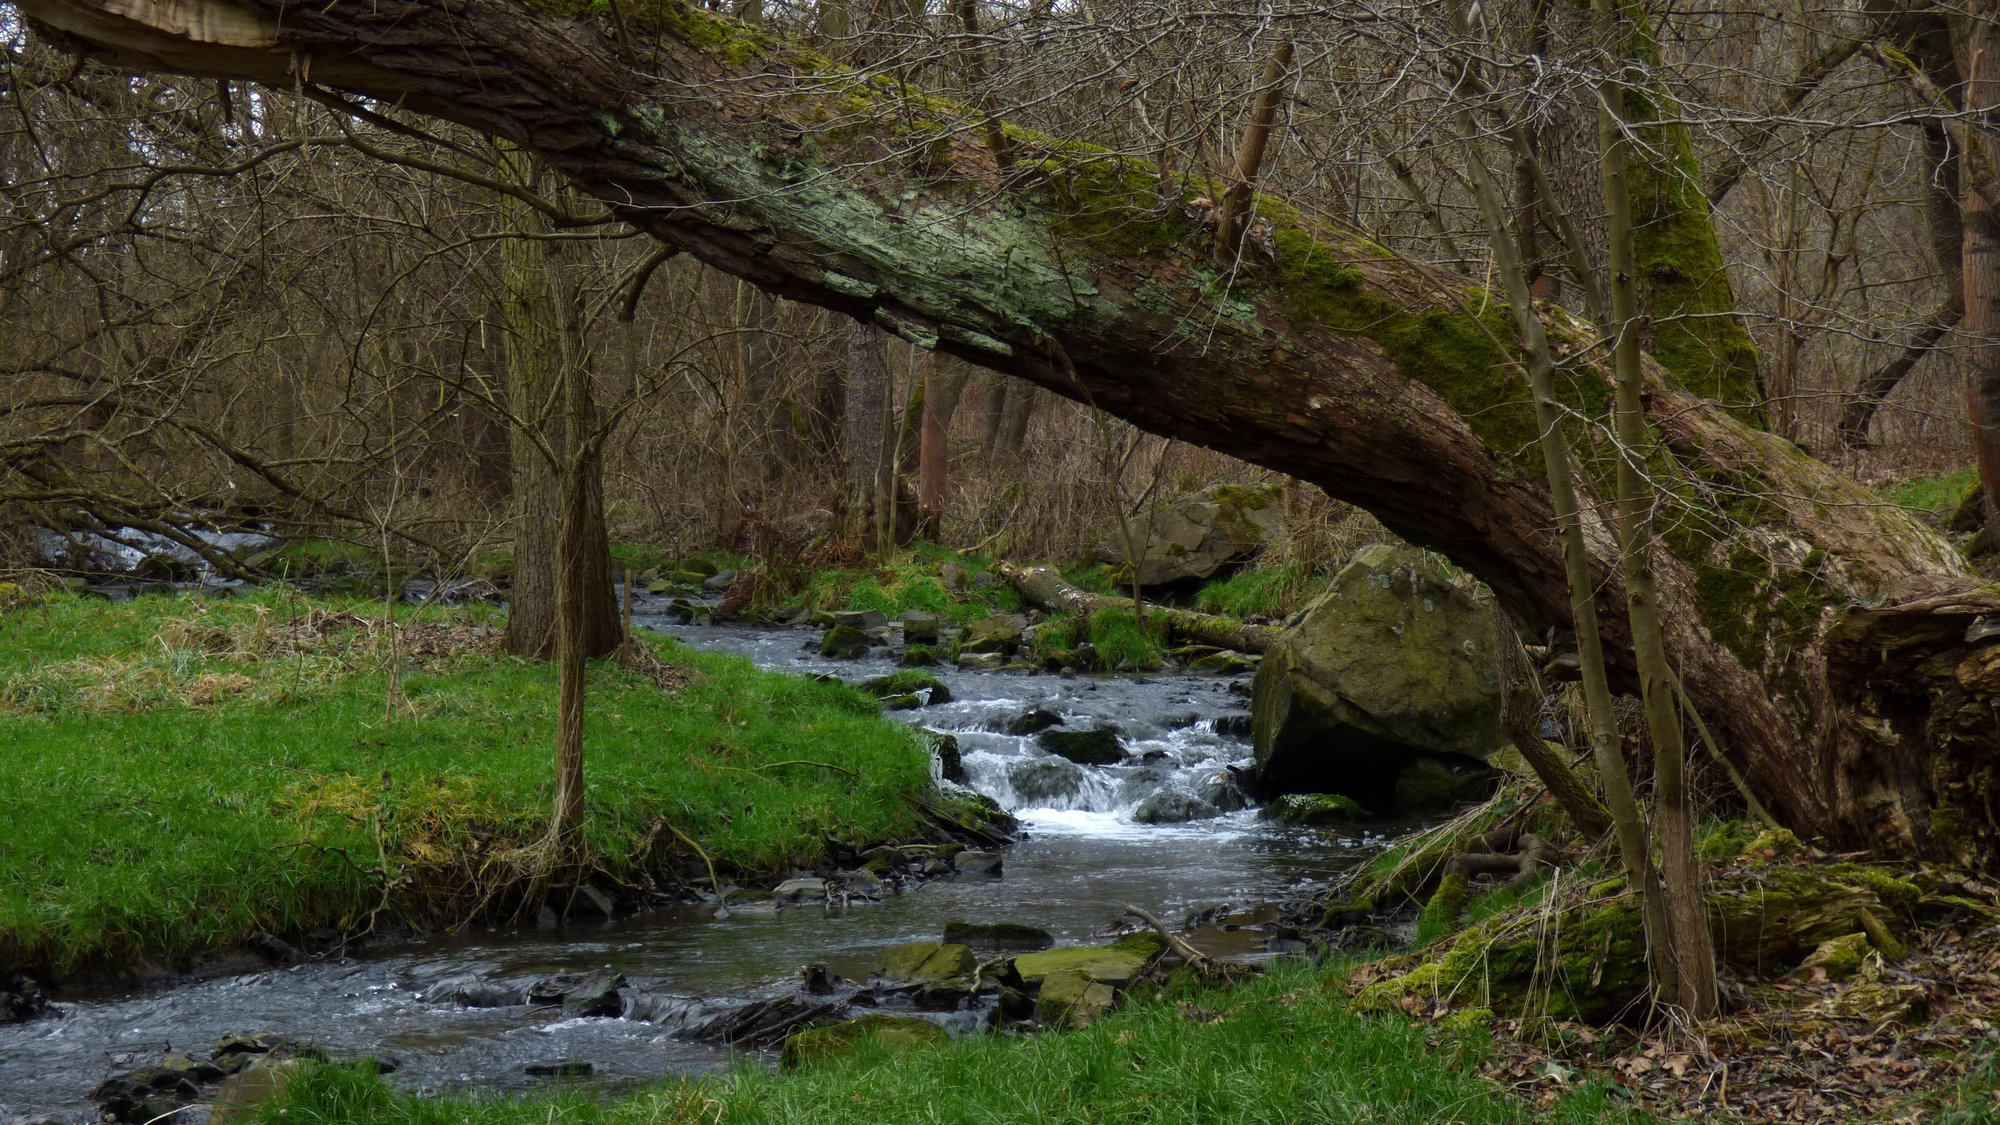 romantická příroda v Tichém údolí